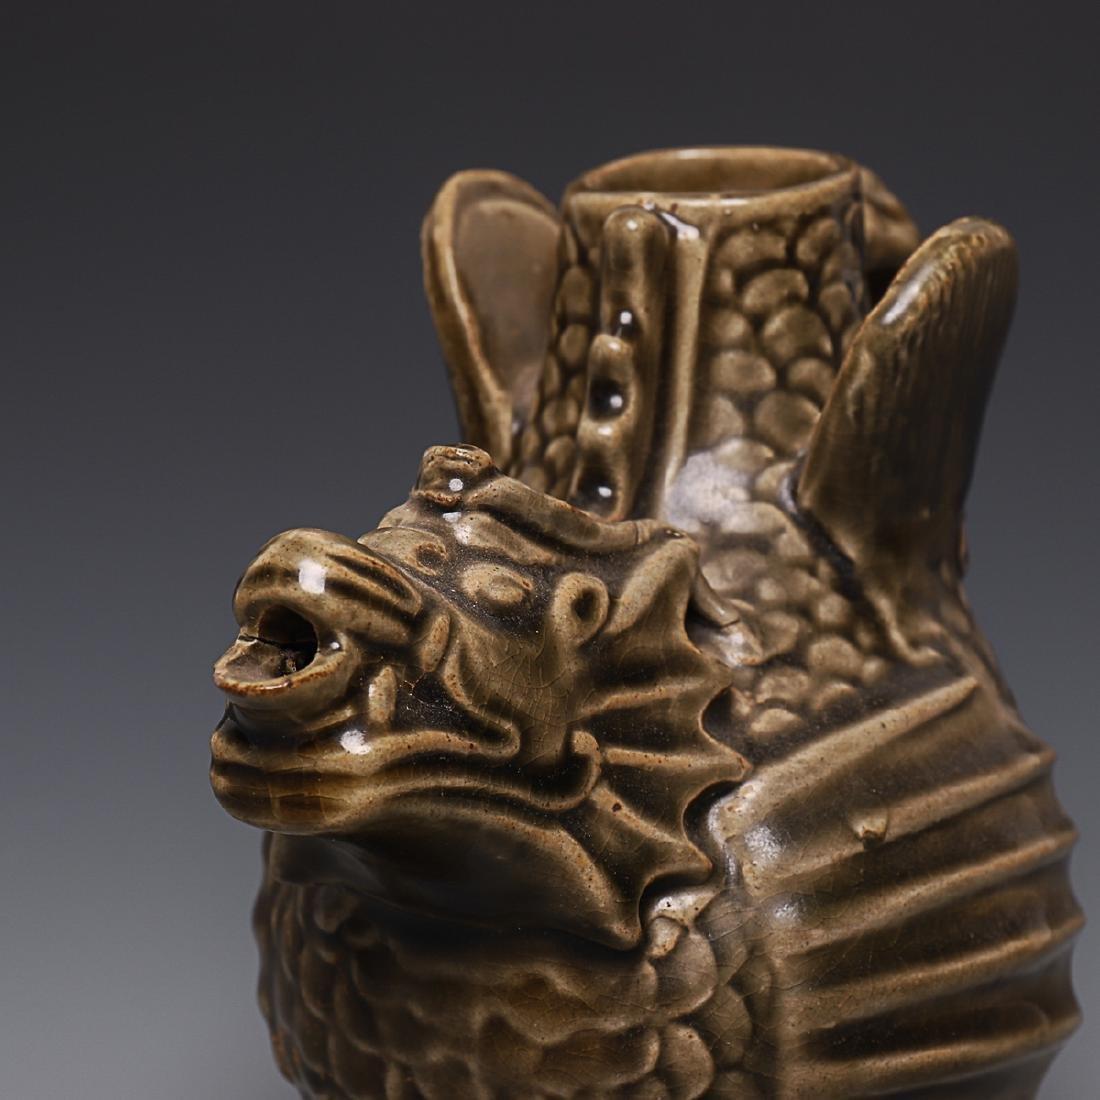 Vintage Chinese Porcelain Pot - 6